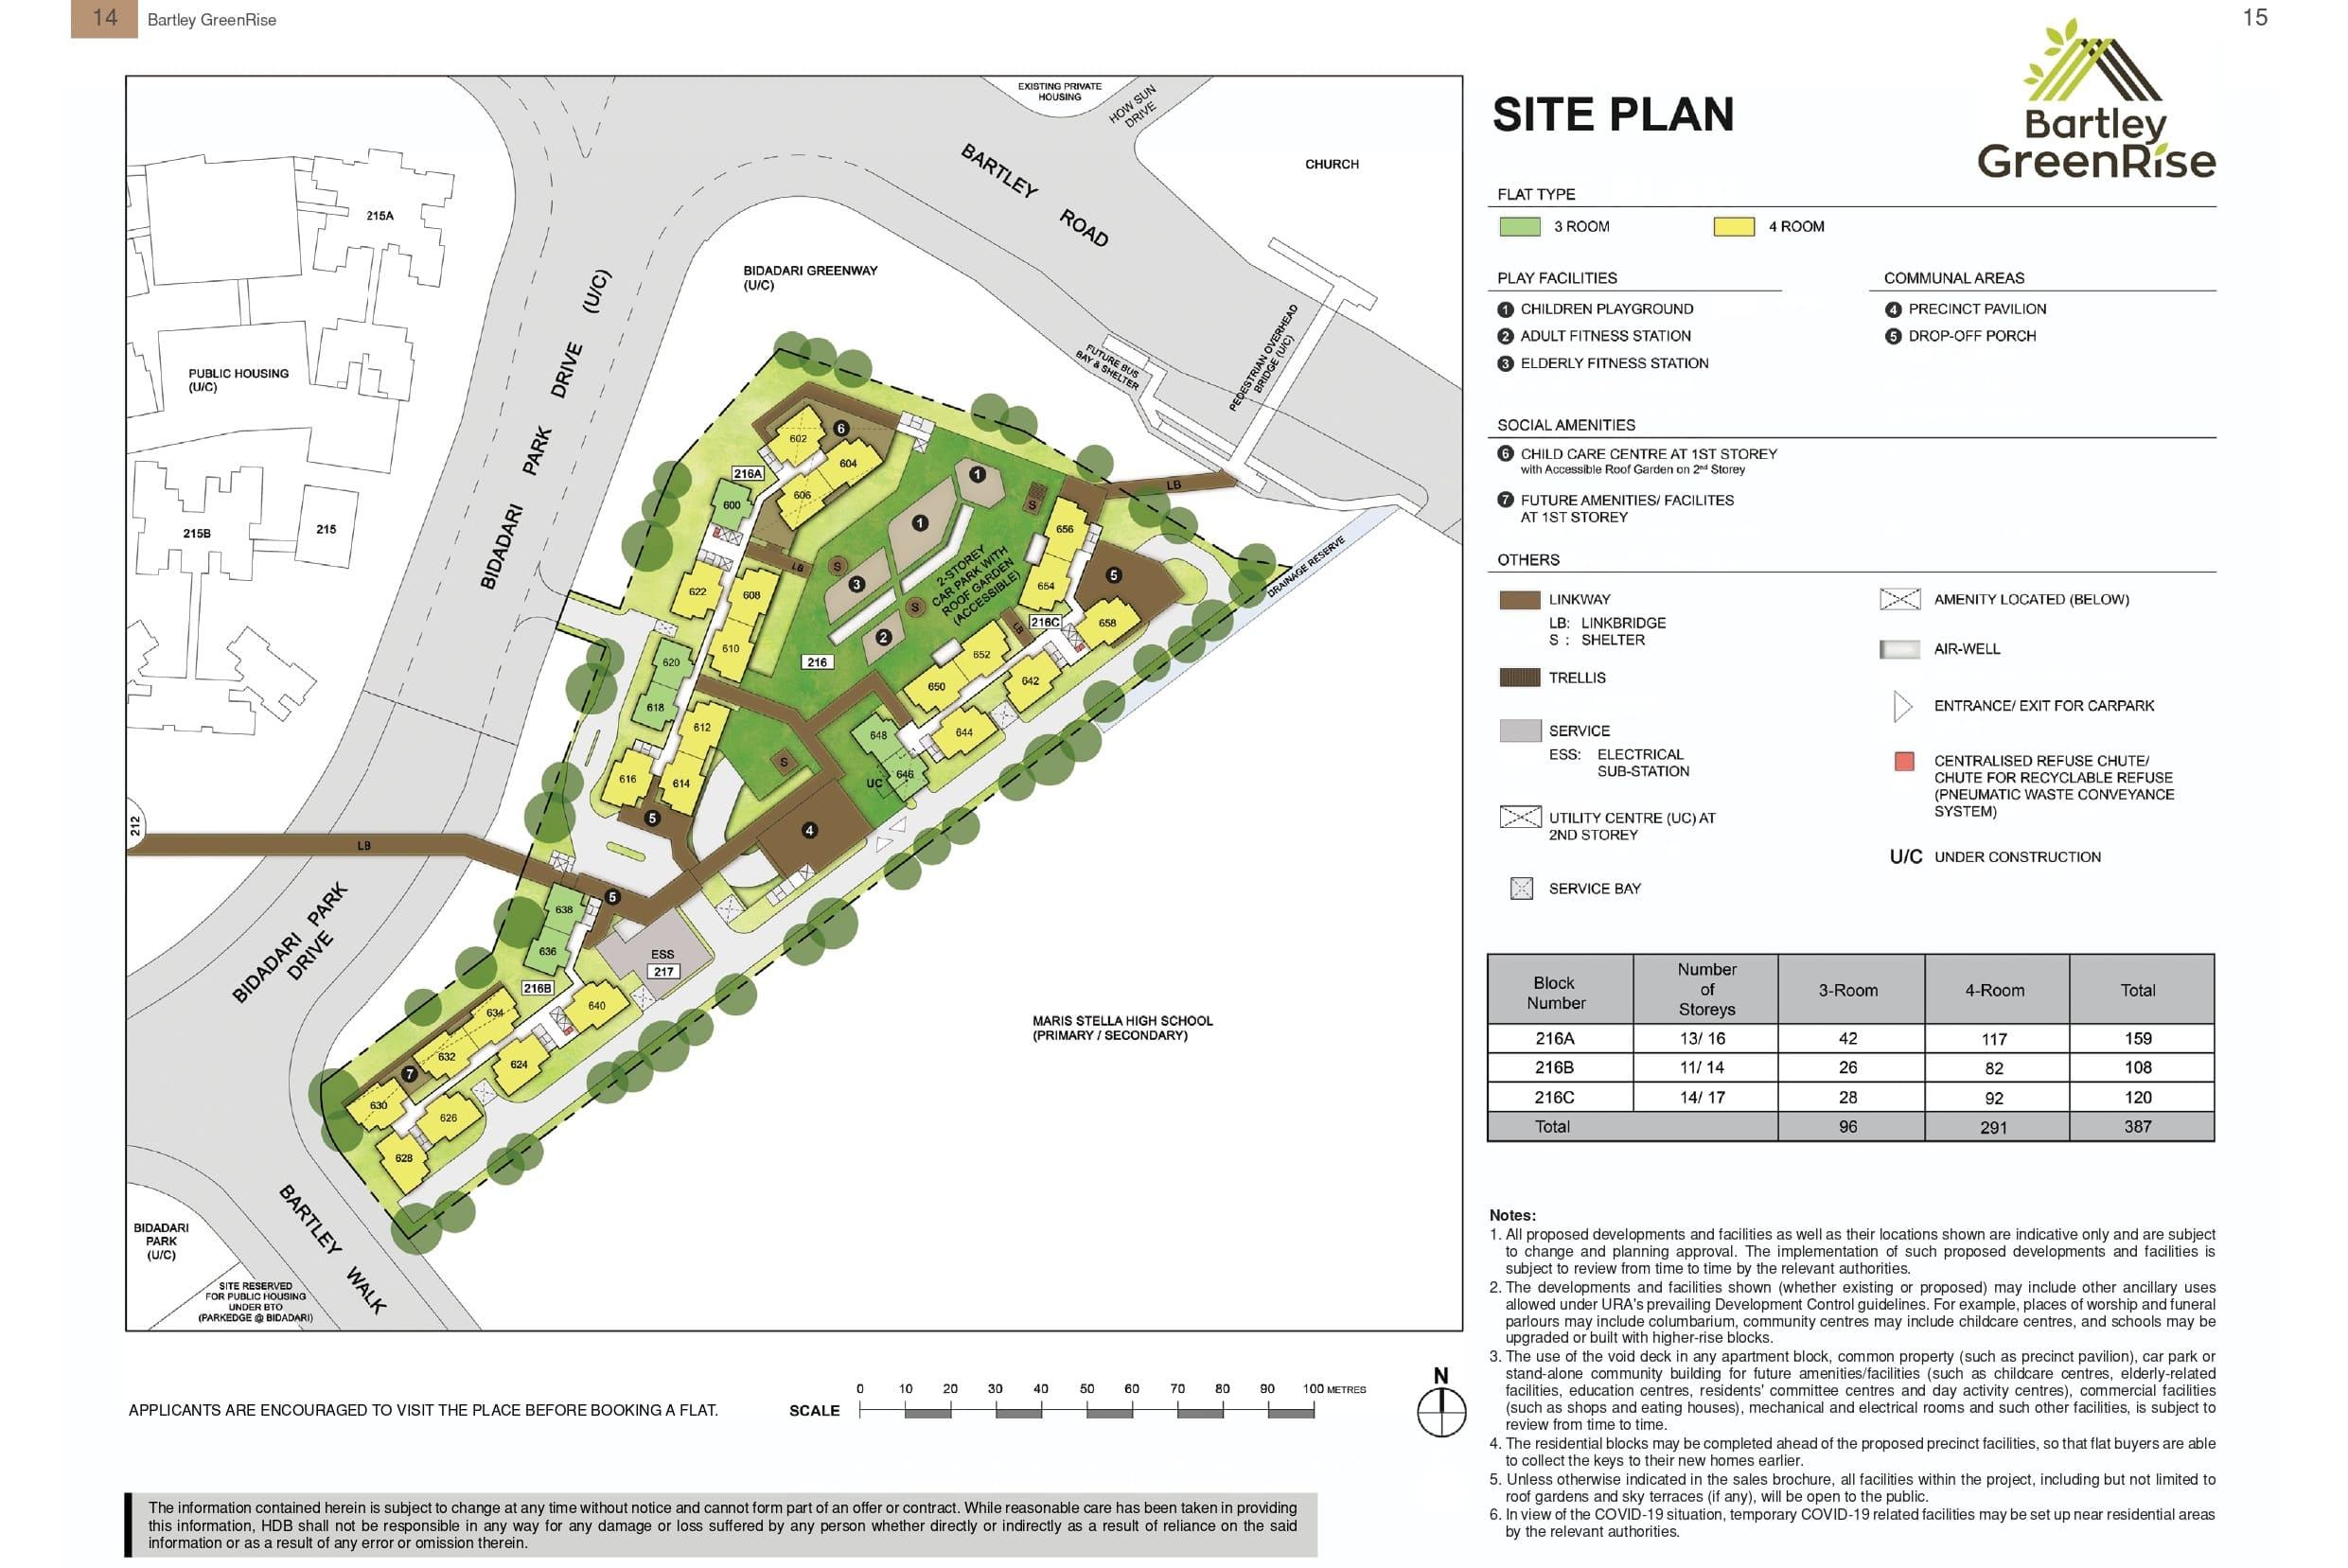 Bartley GreenRise site plan